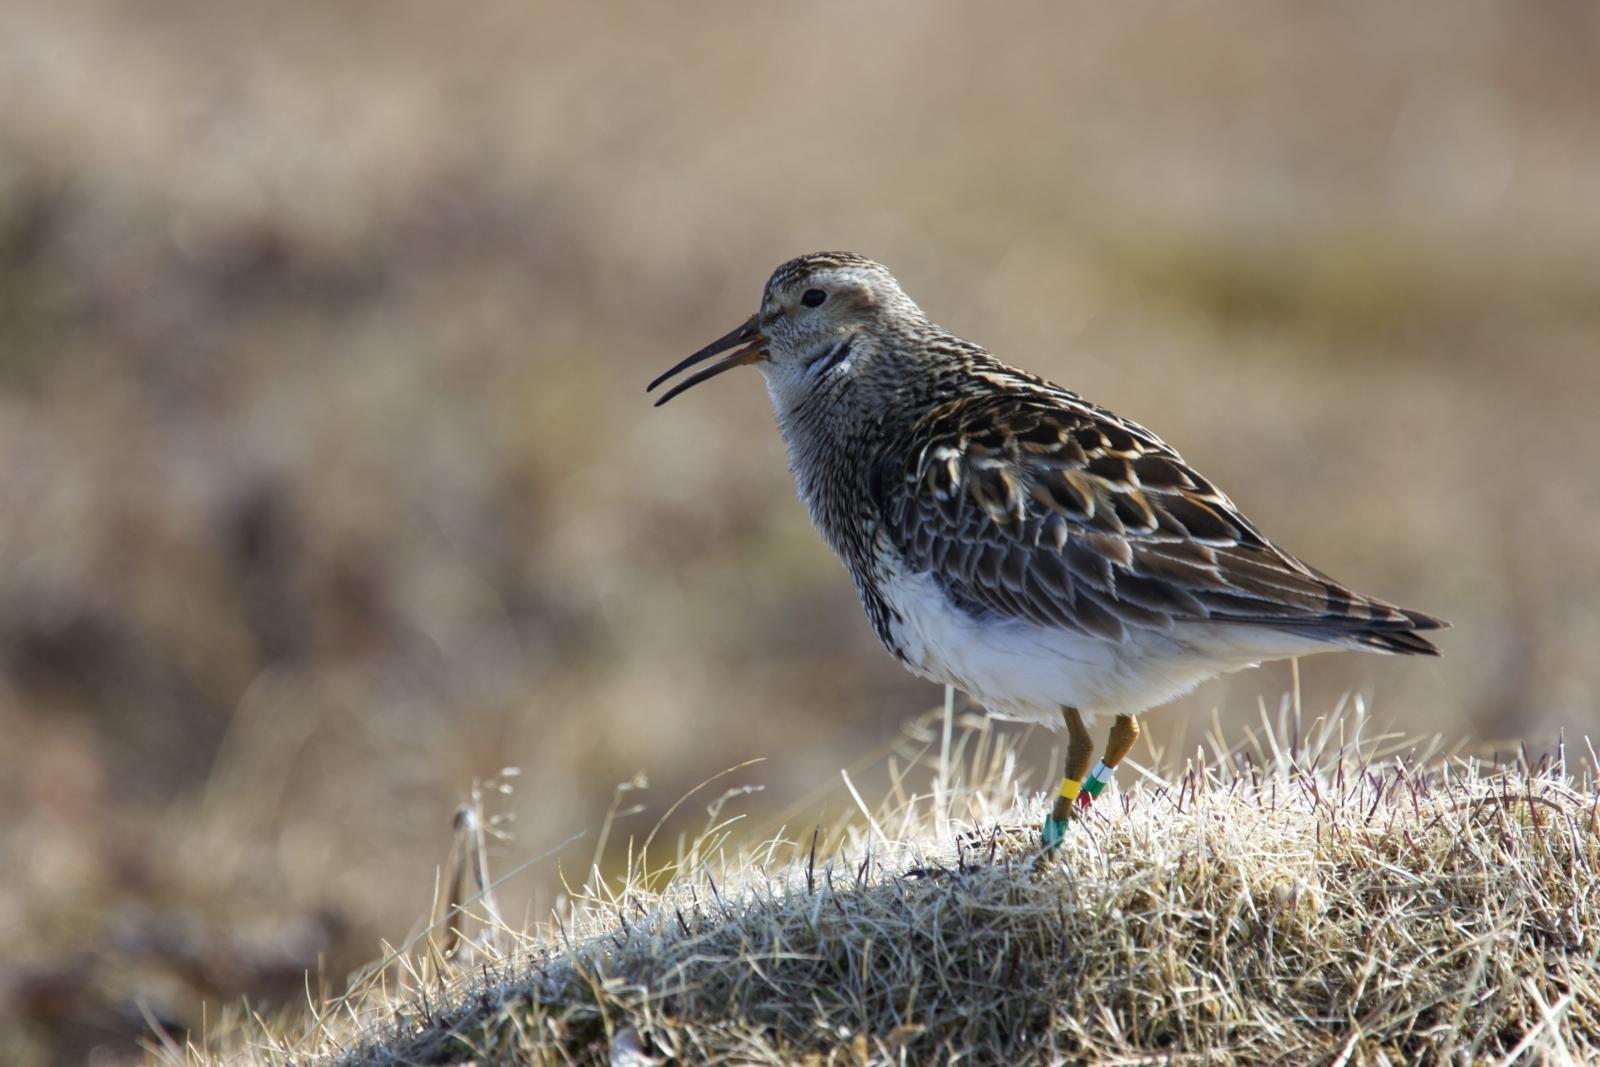 migratory bird reproduction